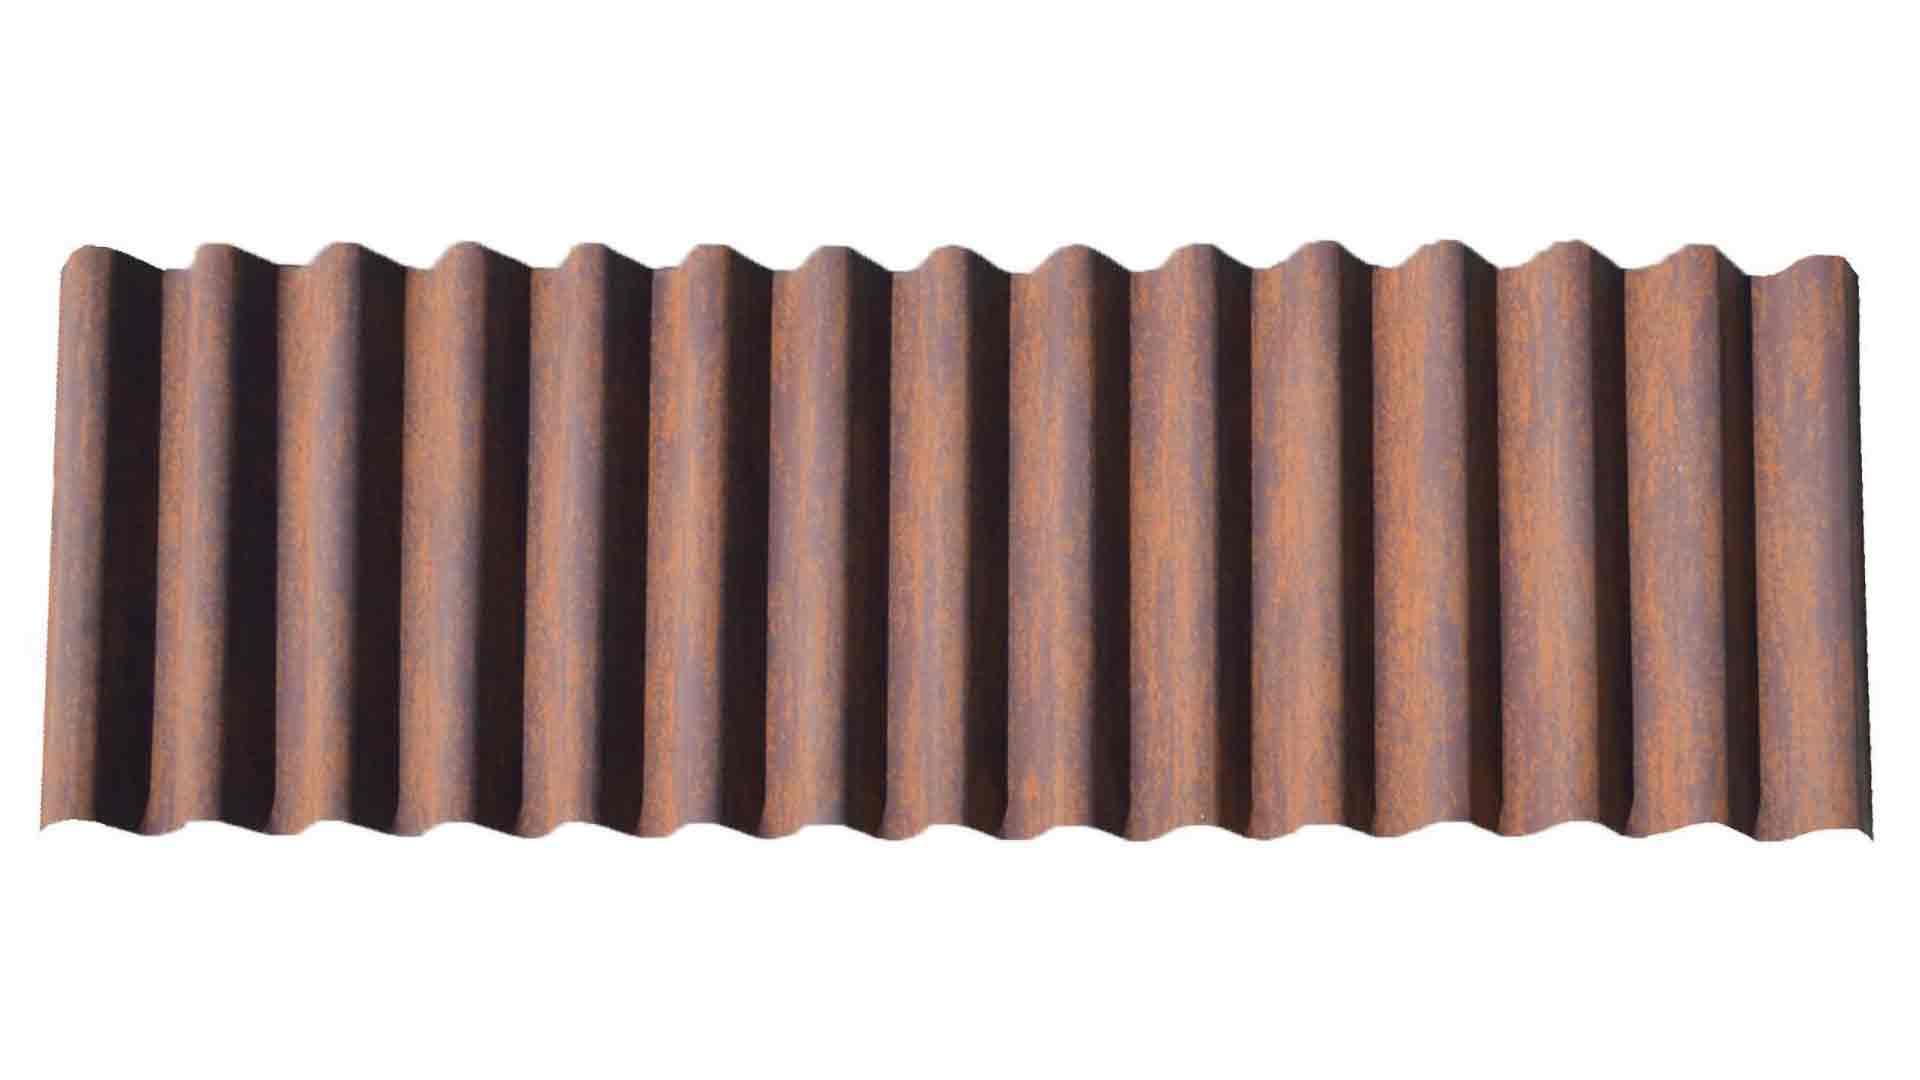 https://f.hubspotusercontent30.net/hubfs/6069238/images/galleries/corten-azp-raw/78-corrugated-corten-azp-raw.jpg